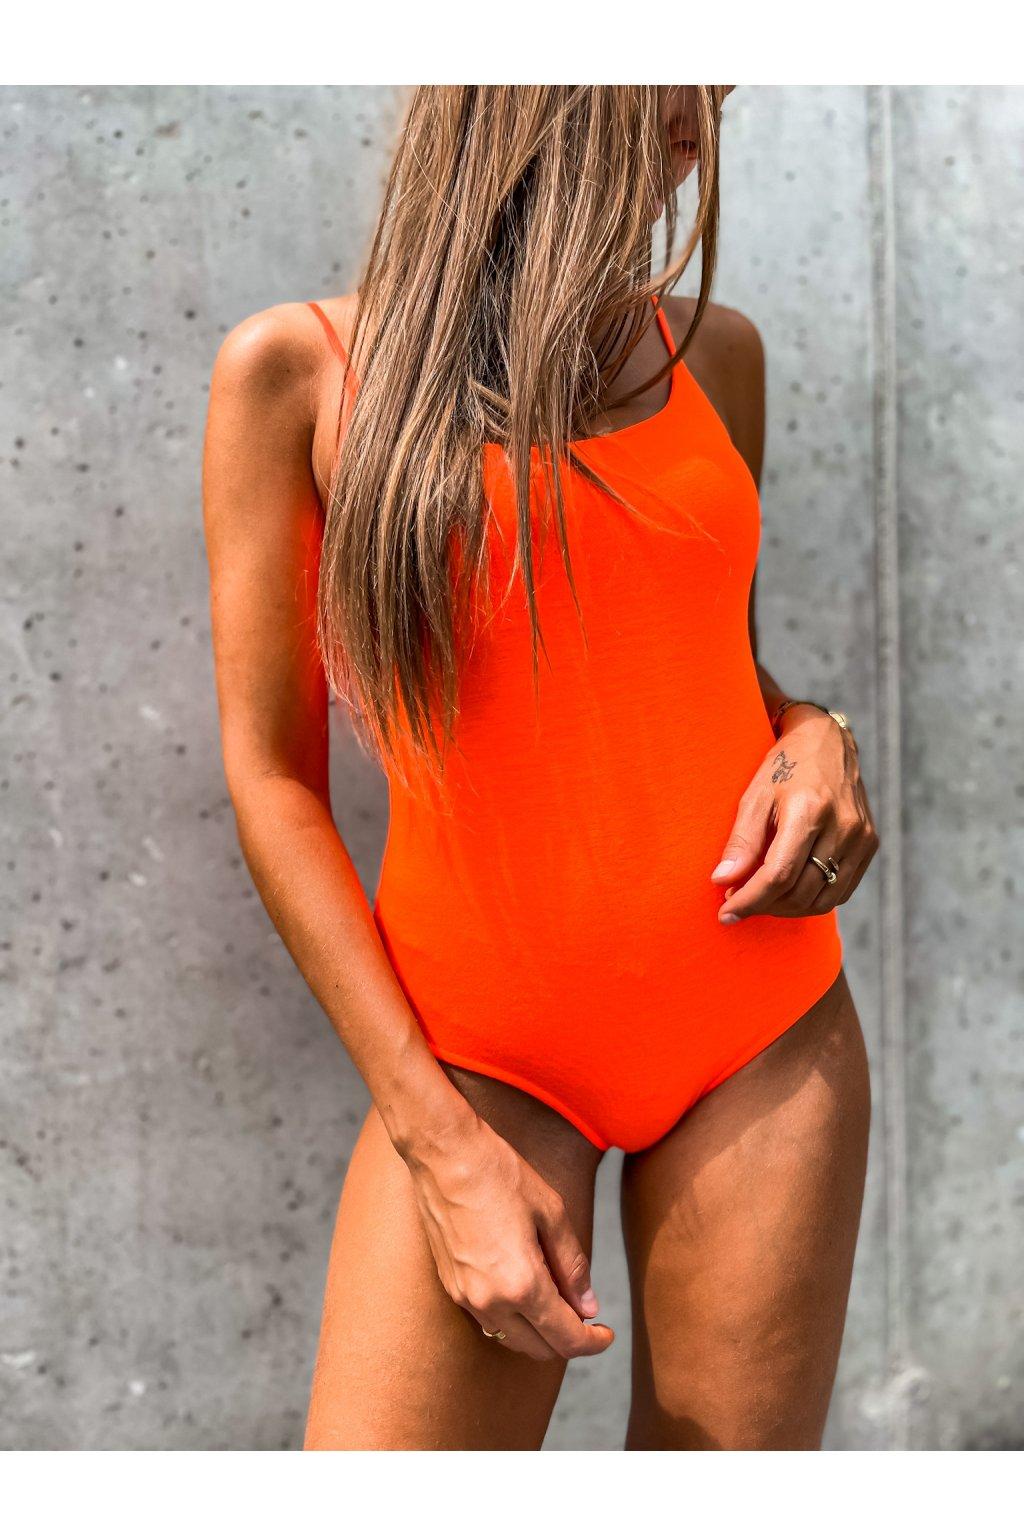 damsky body na raminka neon orange eshopat cz 2